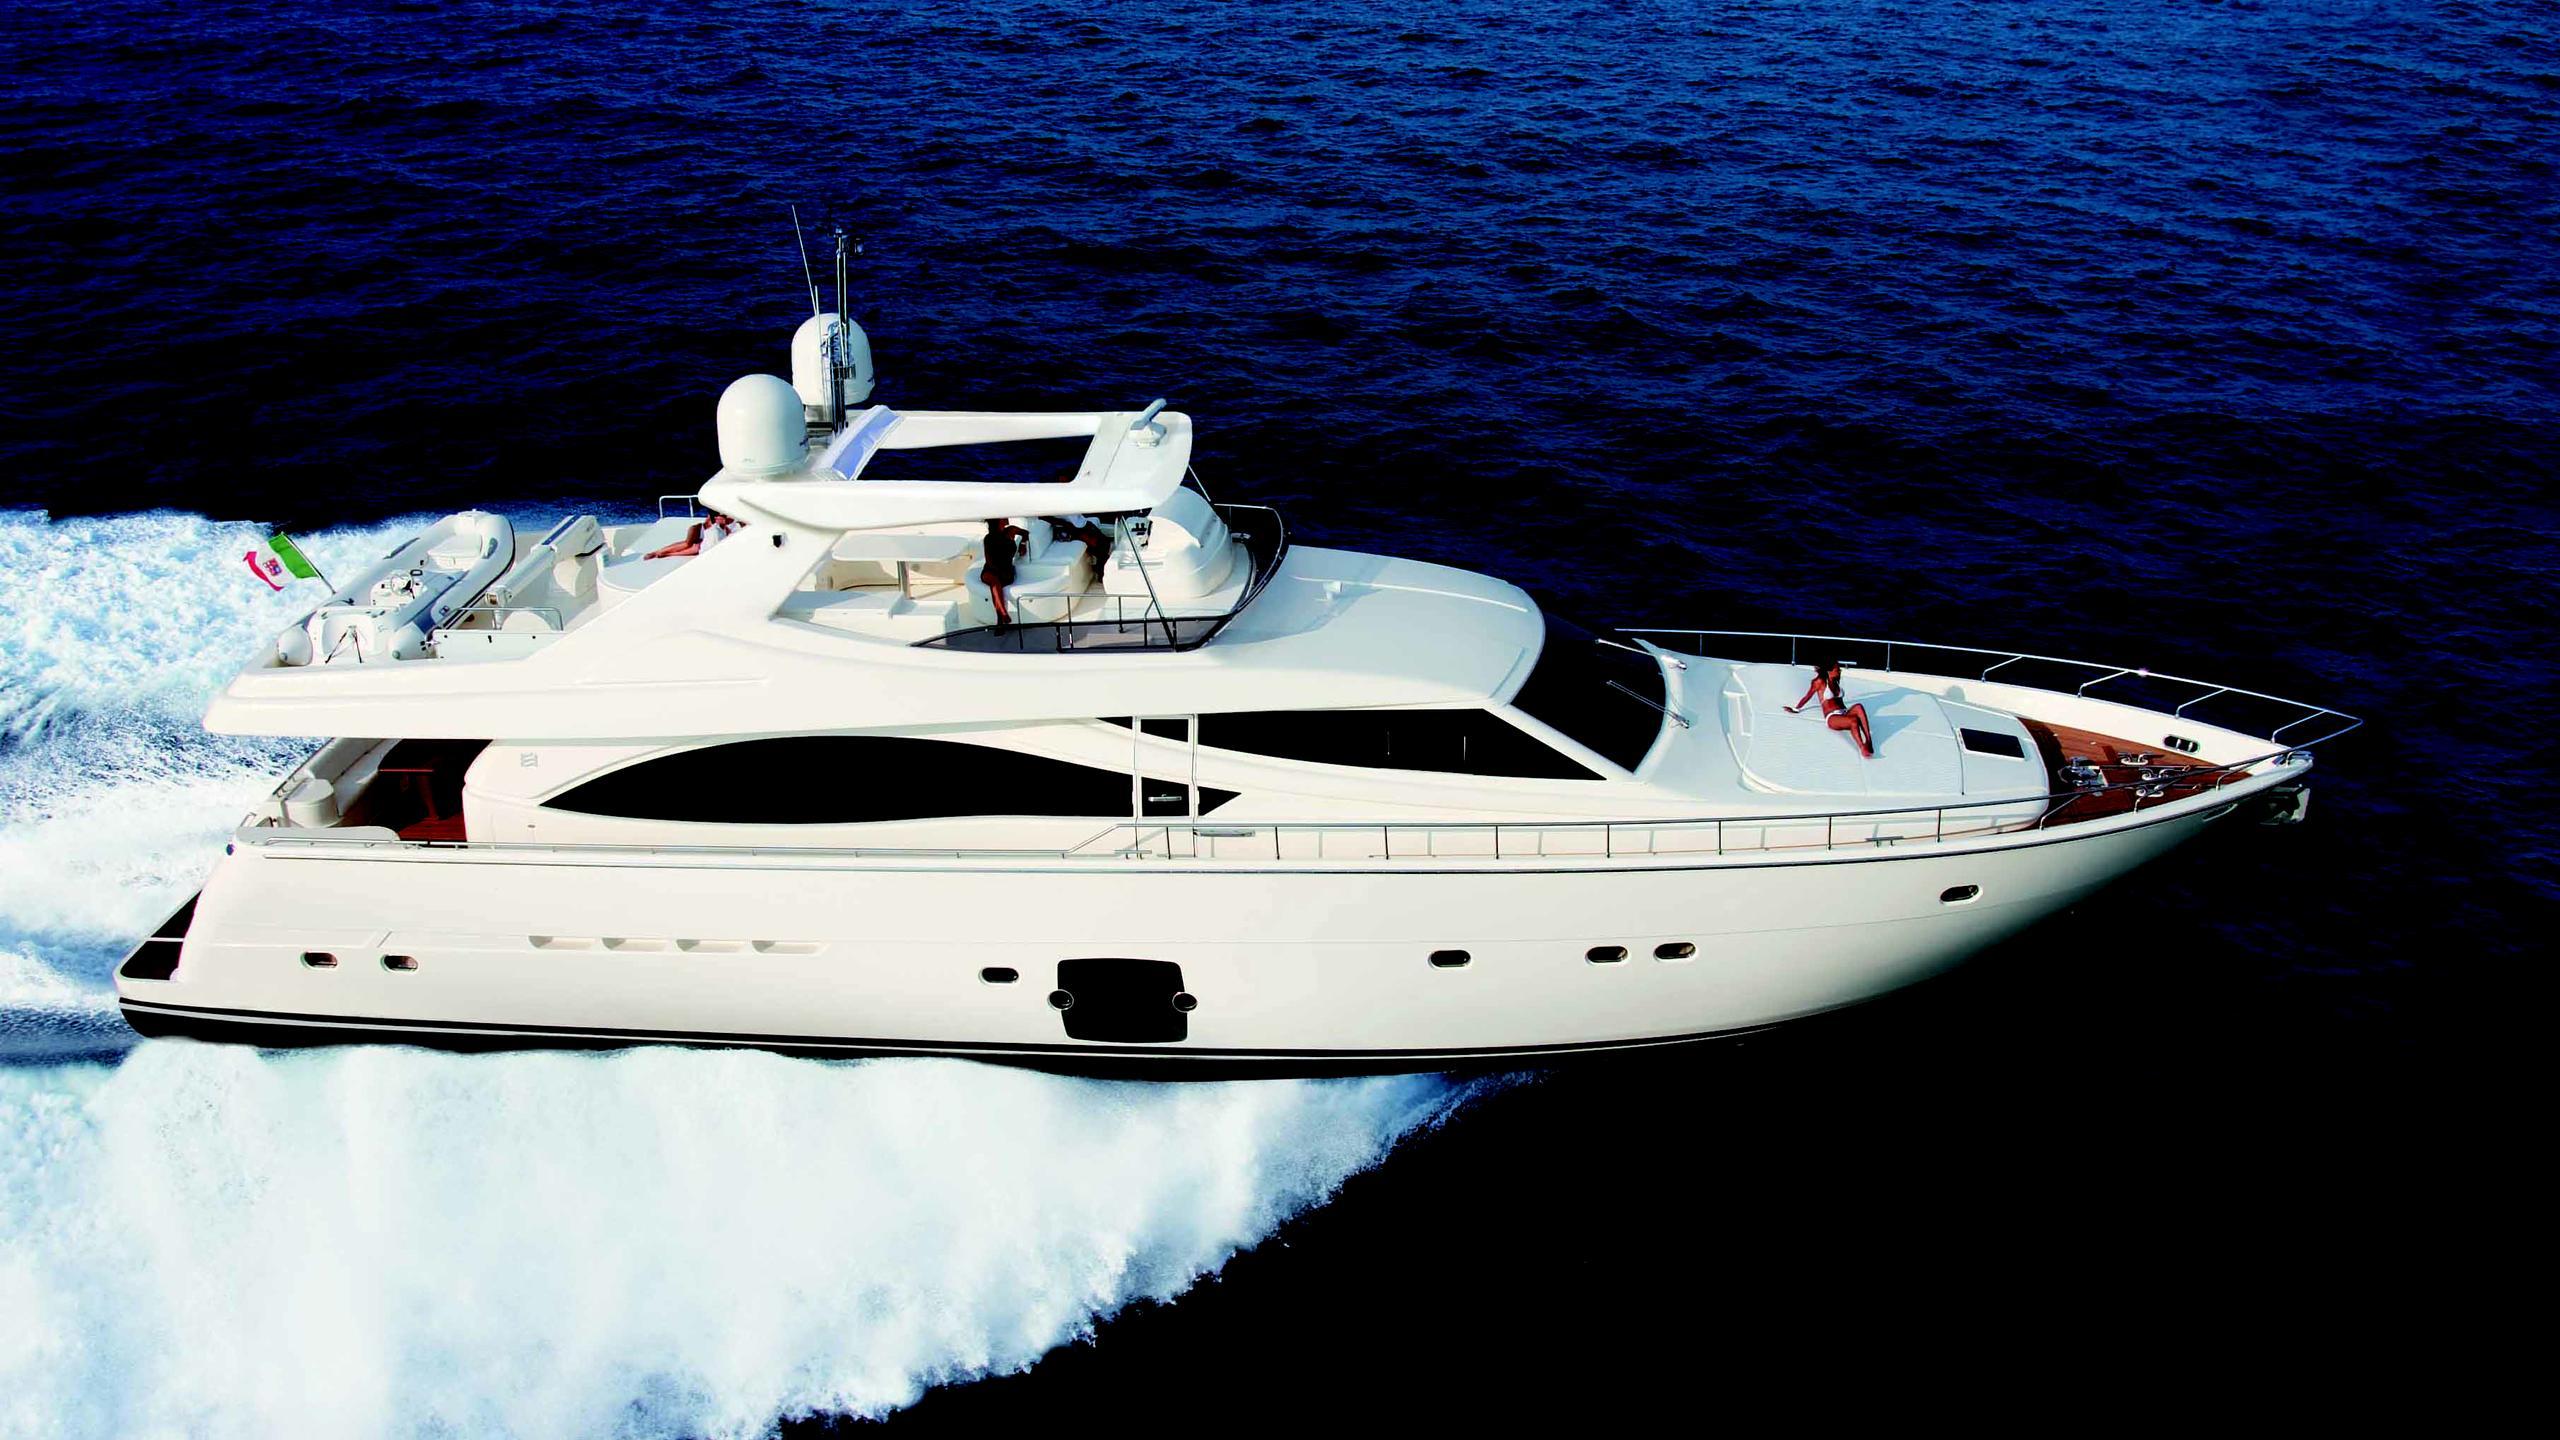 ferretti-830-20-motor-yacht-2006-25m-cruising